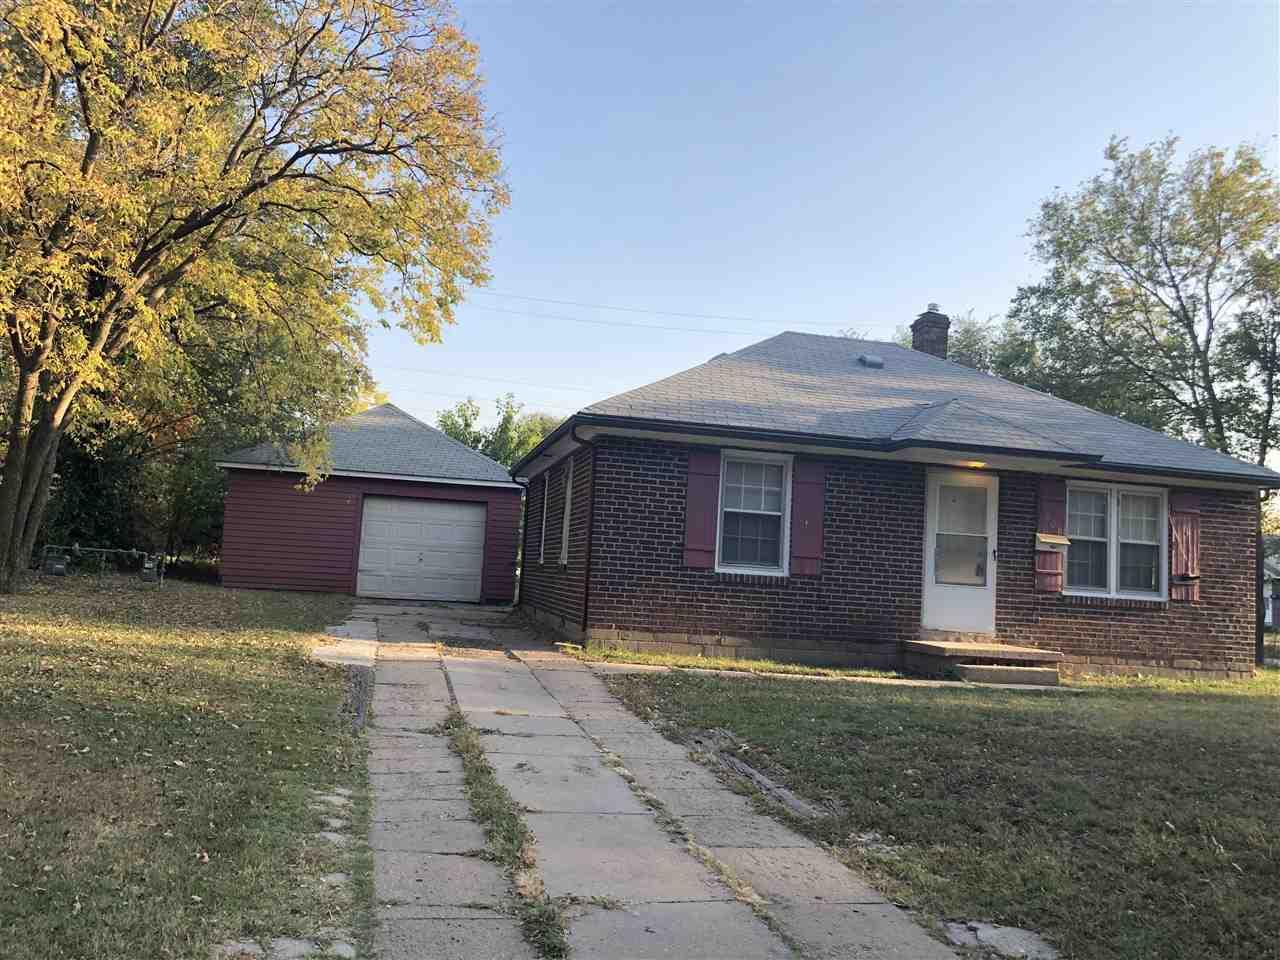 2801 E Shadybrook St, Wichita, KS, 67214